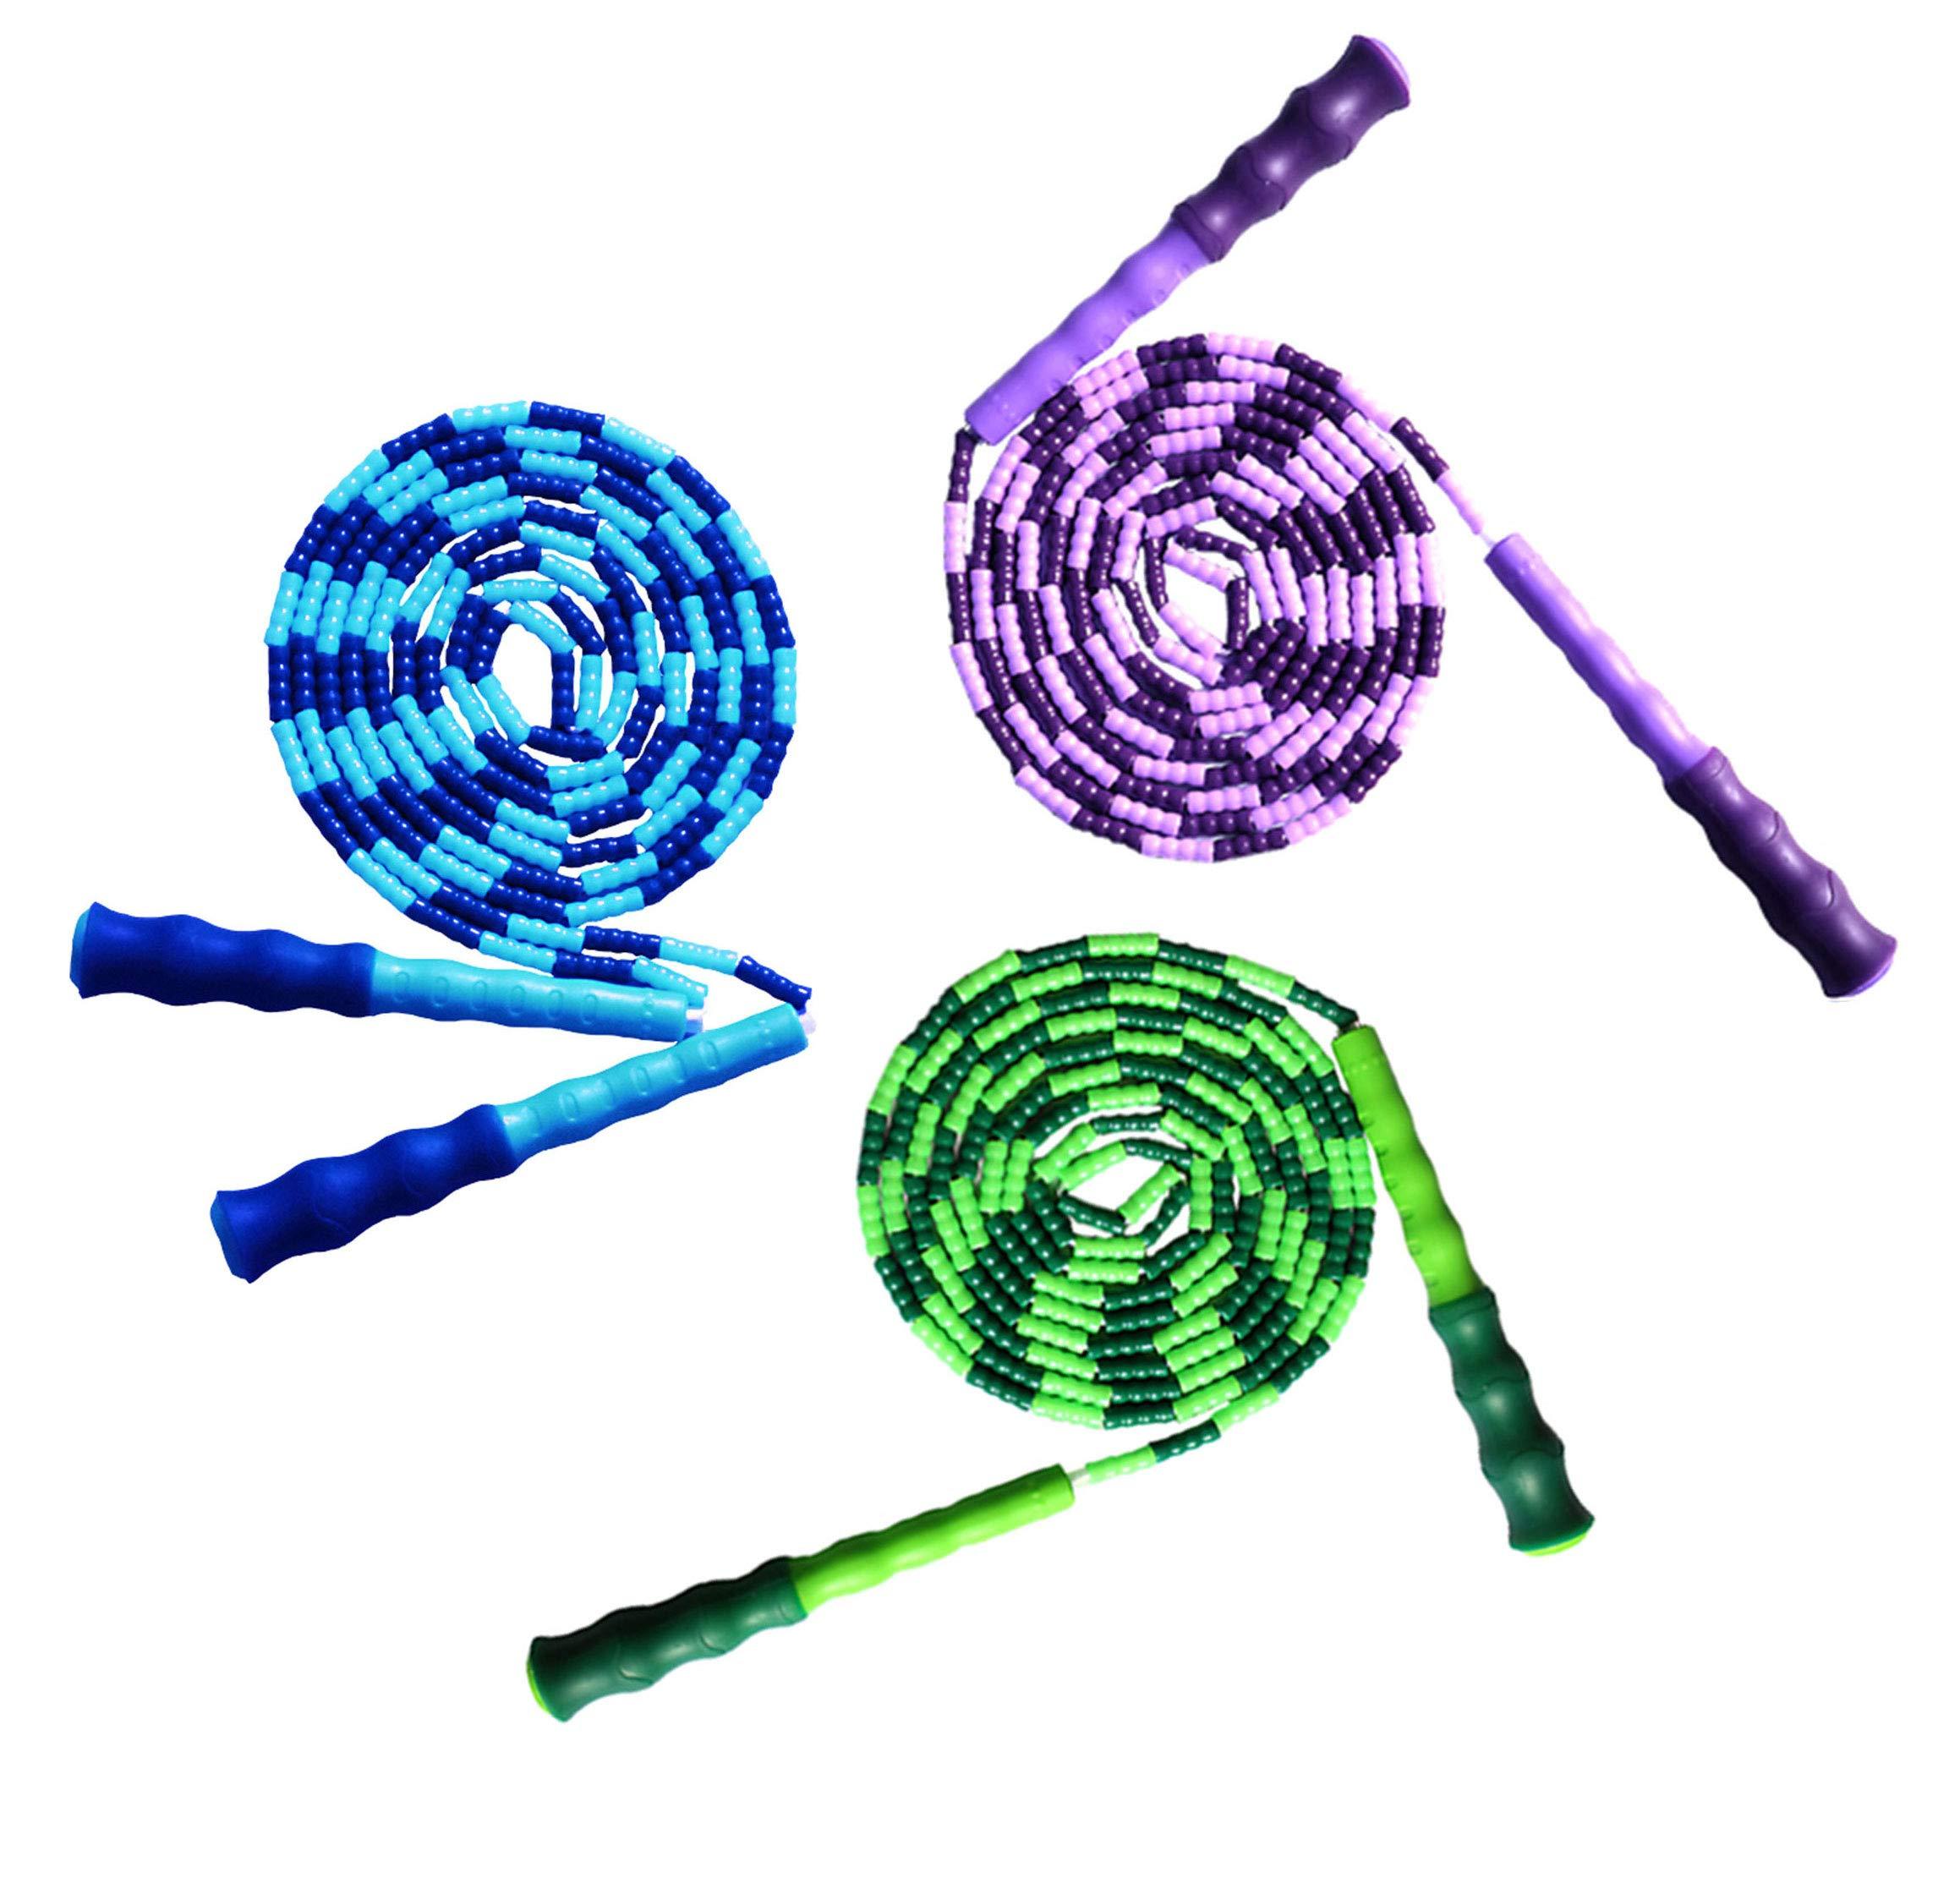 LETUSPORT 9 Feet Adjustable Beaded Segmented Jump Rope for Women Men Kids Lightweight Work Out Speeding Jumping Ropes (Blue+Purple+Green, 3 pcs)